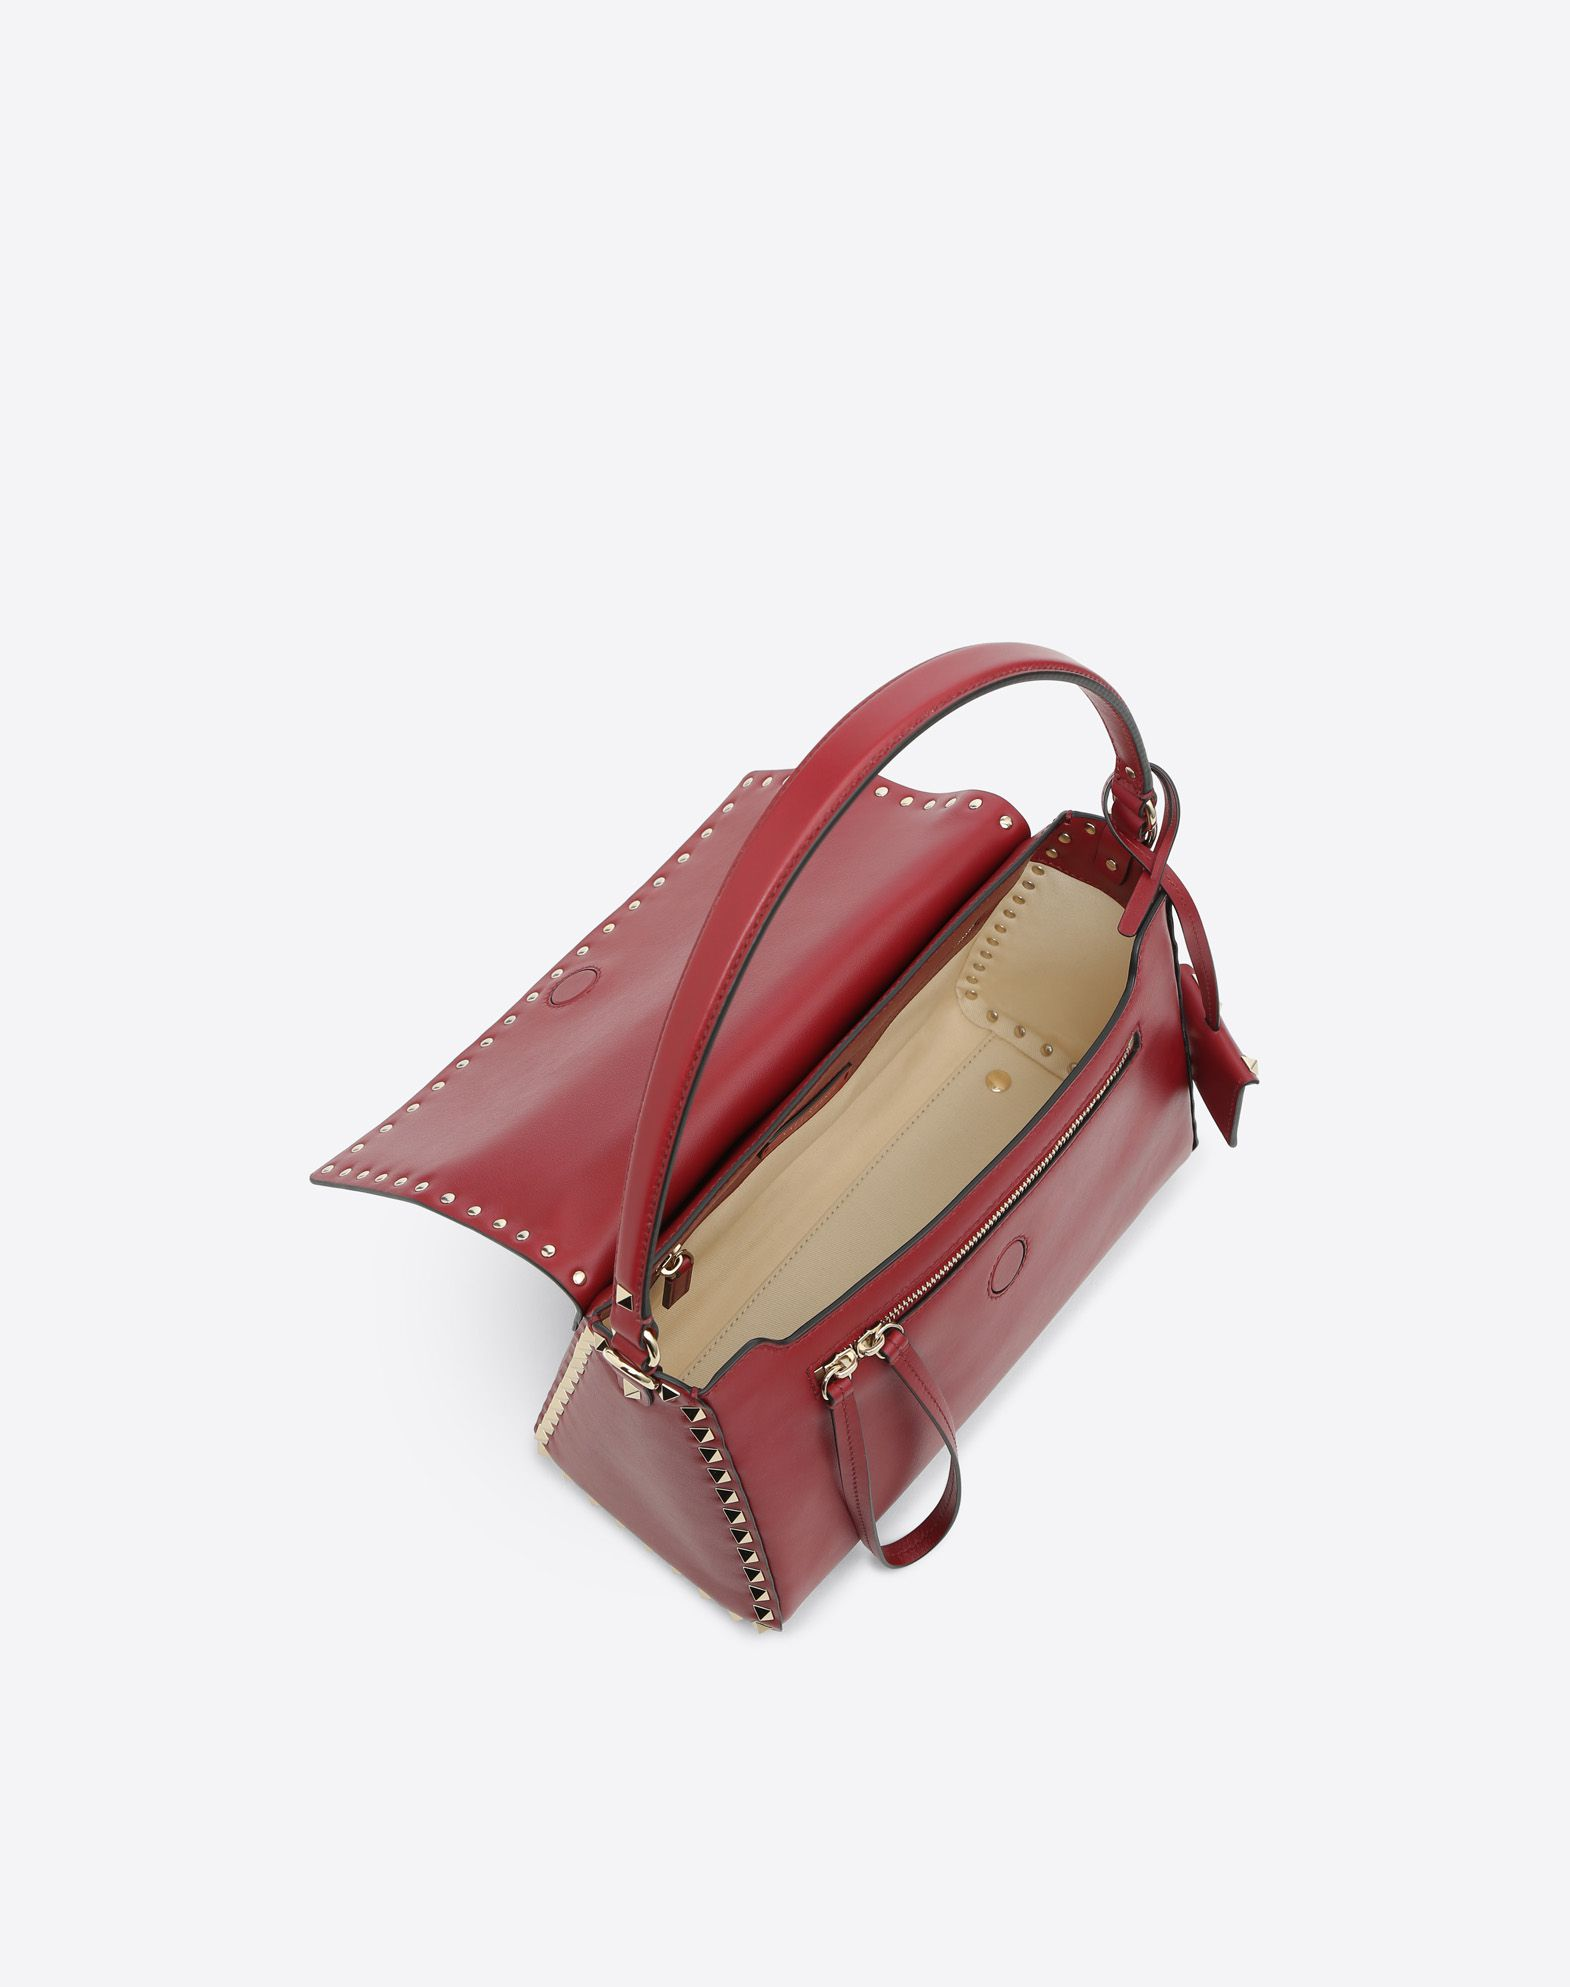 VALENTINO GARAVANI Rockstud Single Handle Bag HANDBAG D e